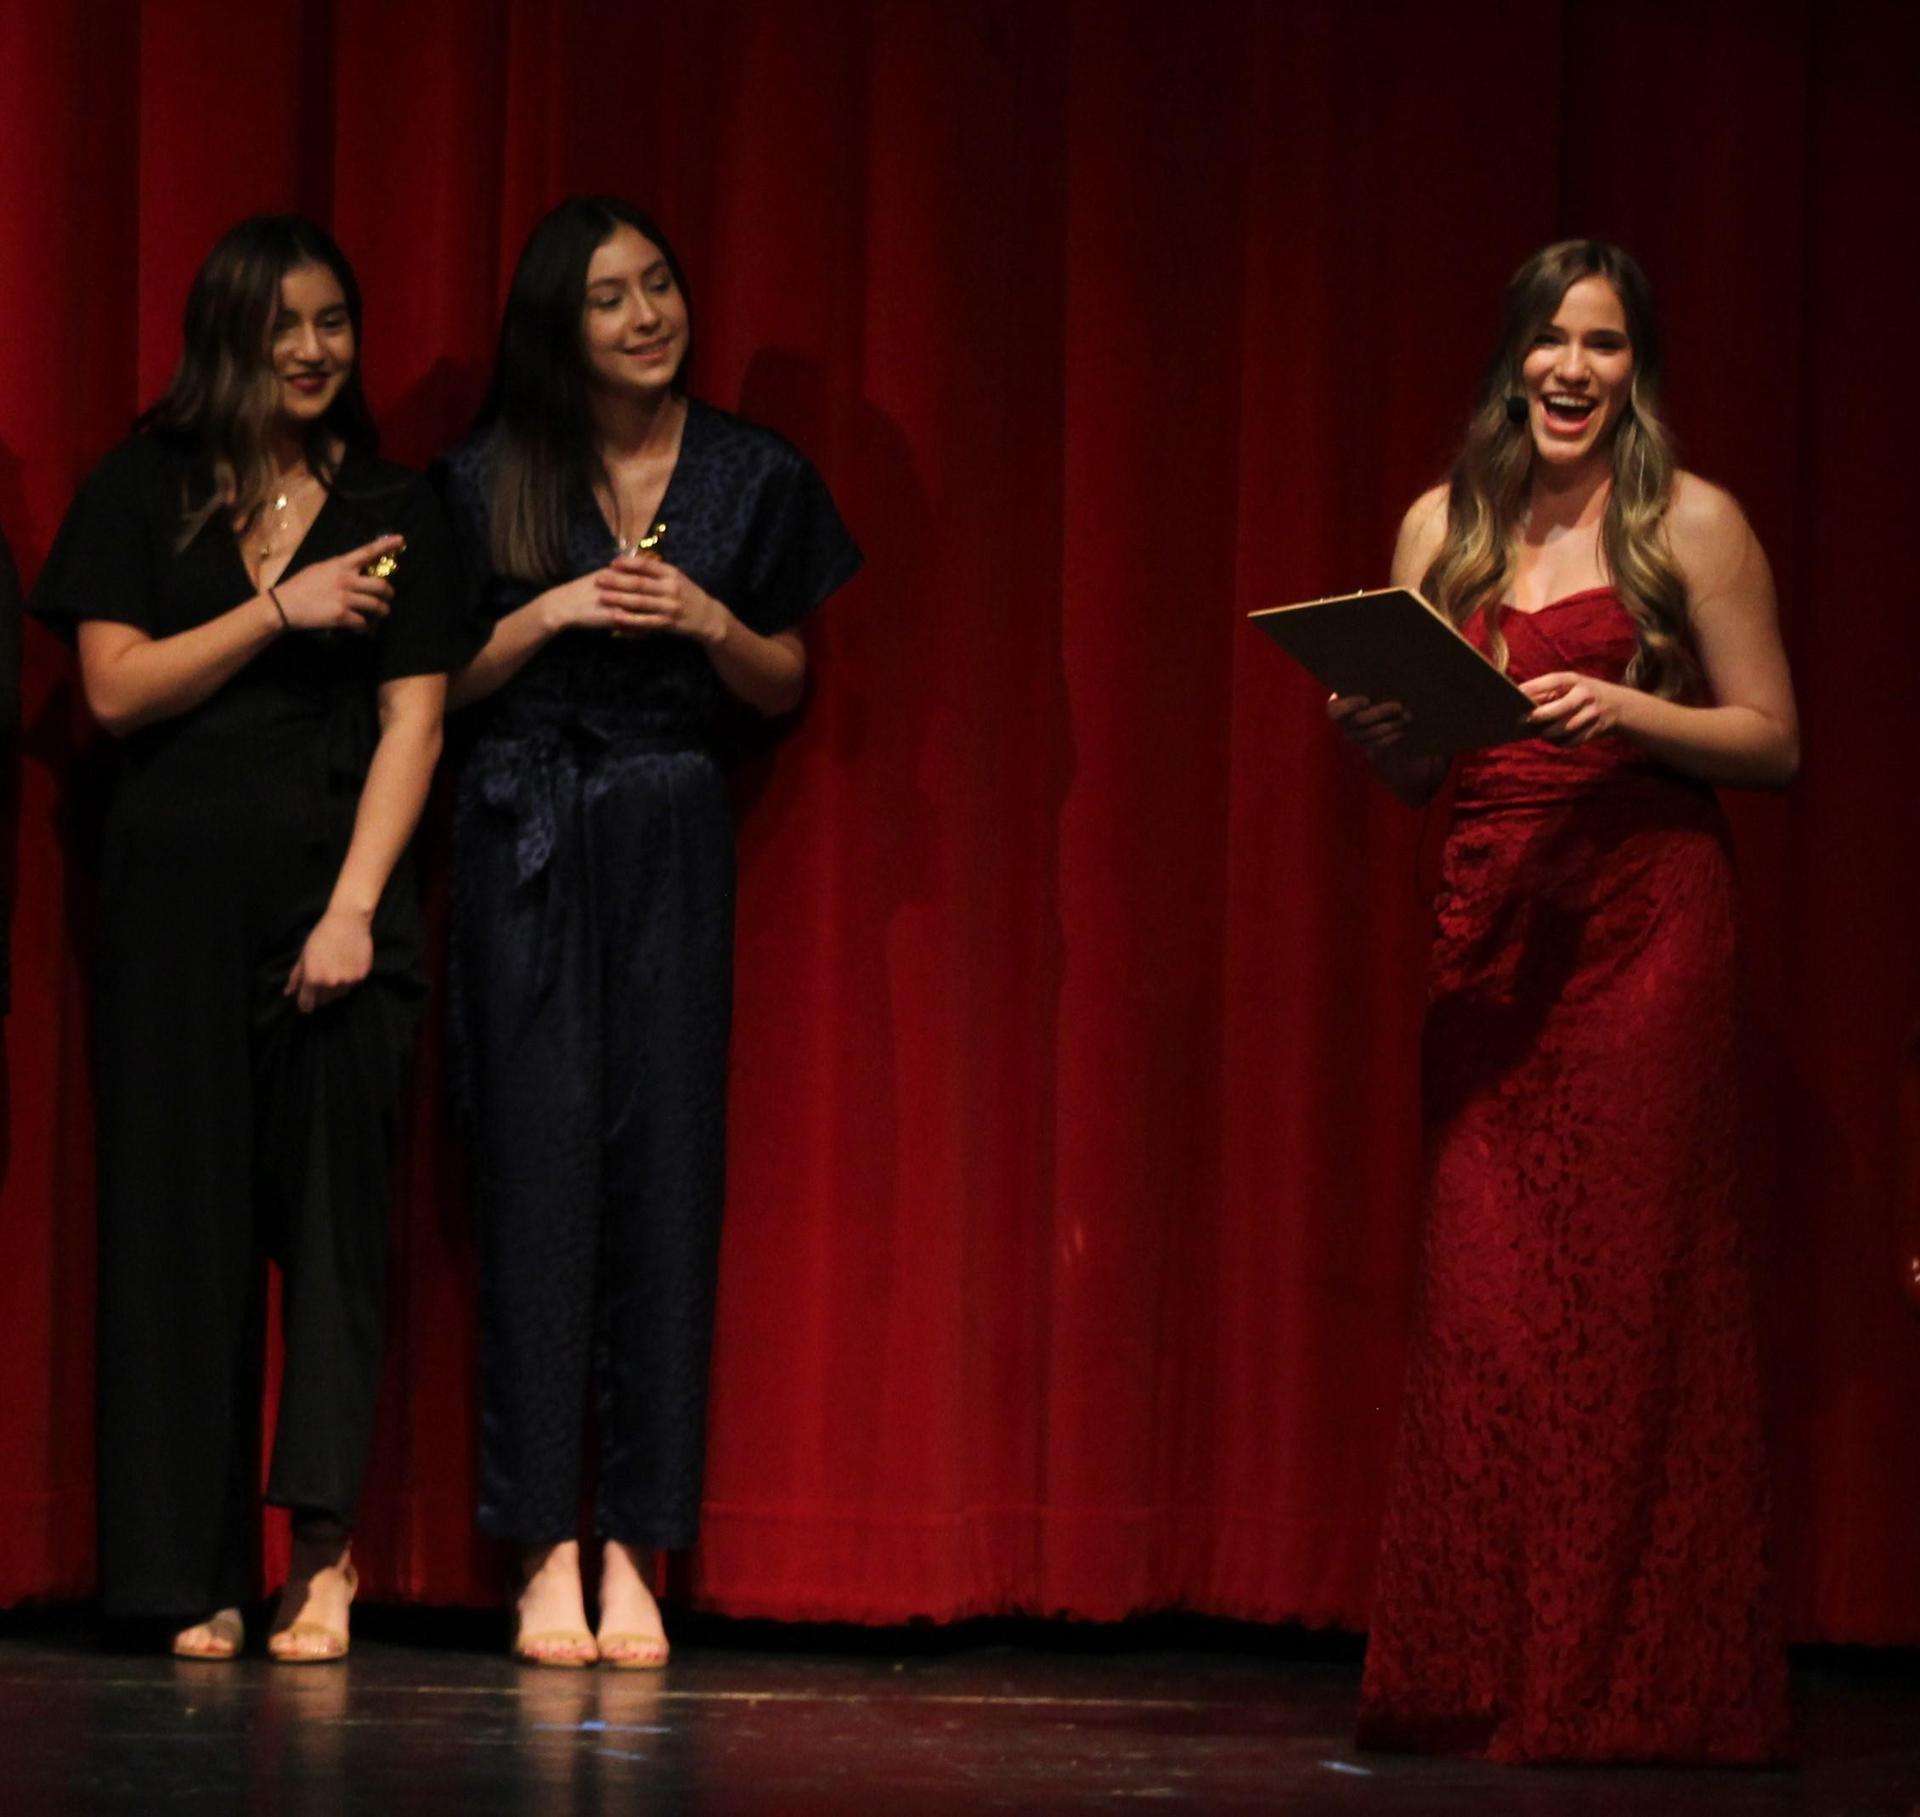 Milli Montez, Lexi Montez and Christina Fuller